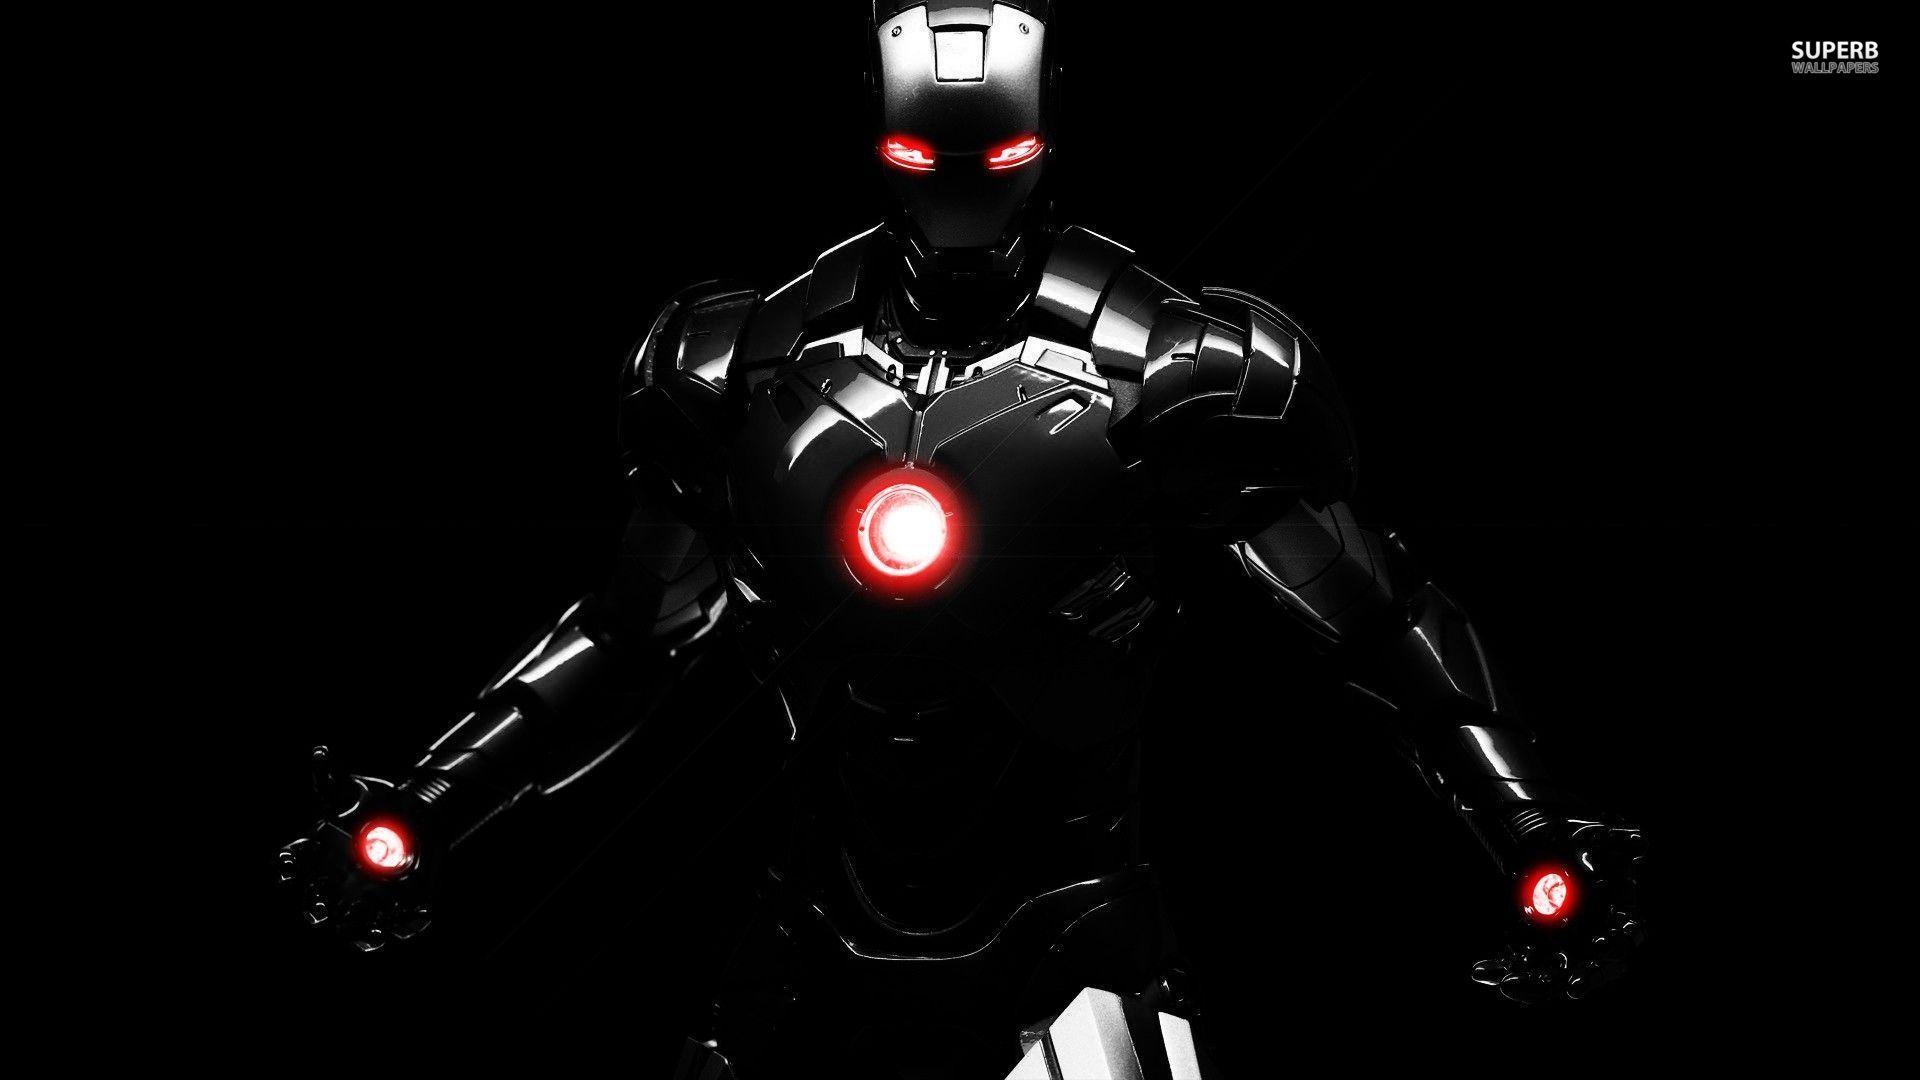 Iron Man Wallpaper 4k Wallpapersafari